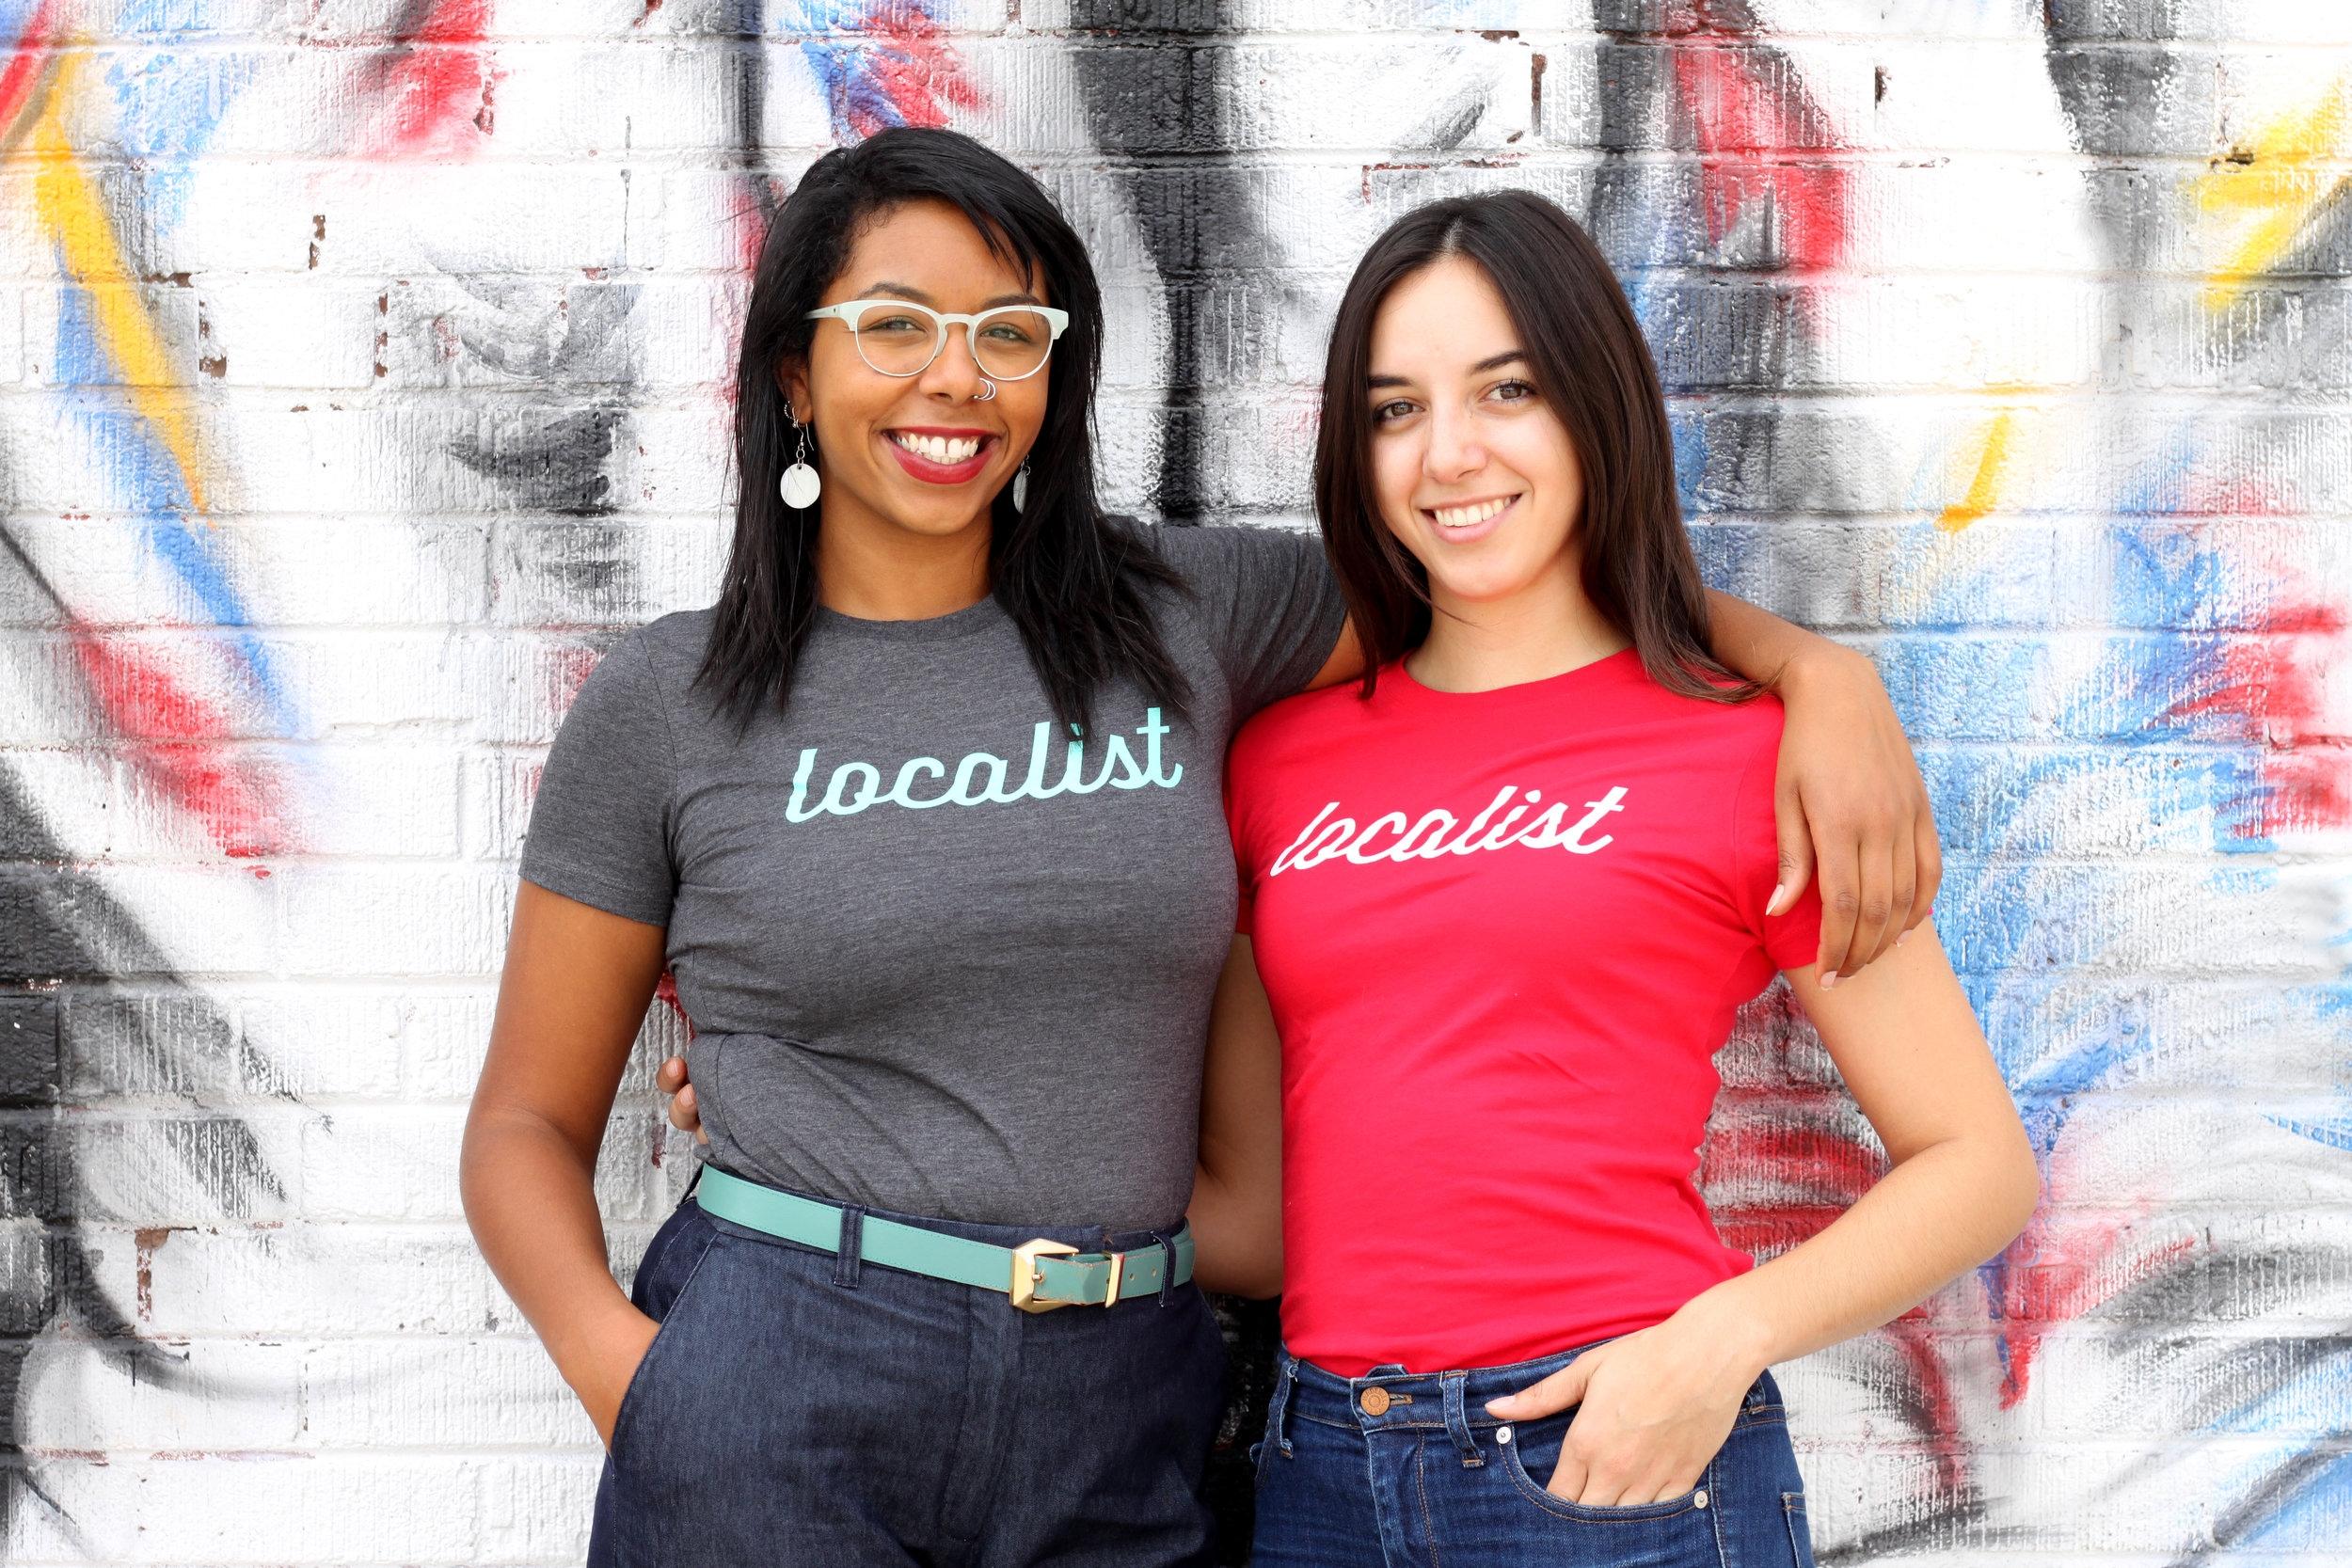 Localist shirts maya olga.jpg